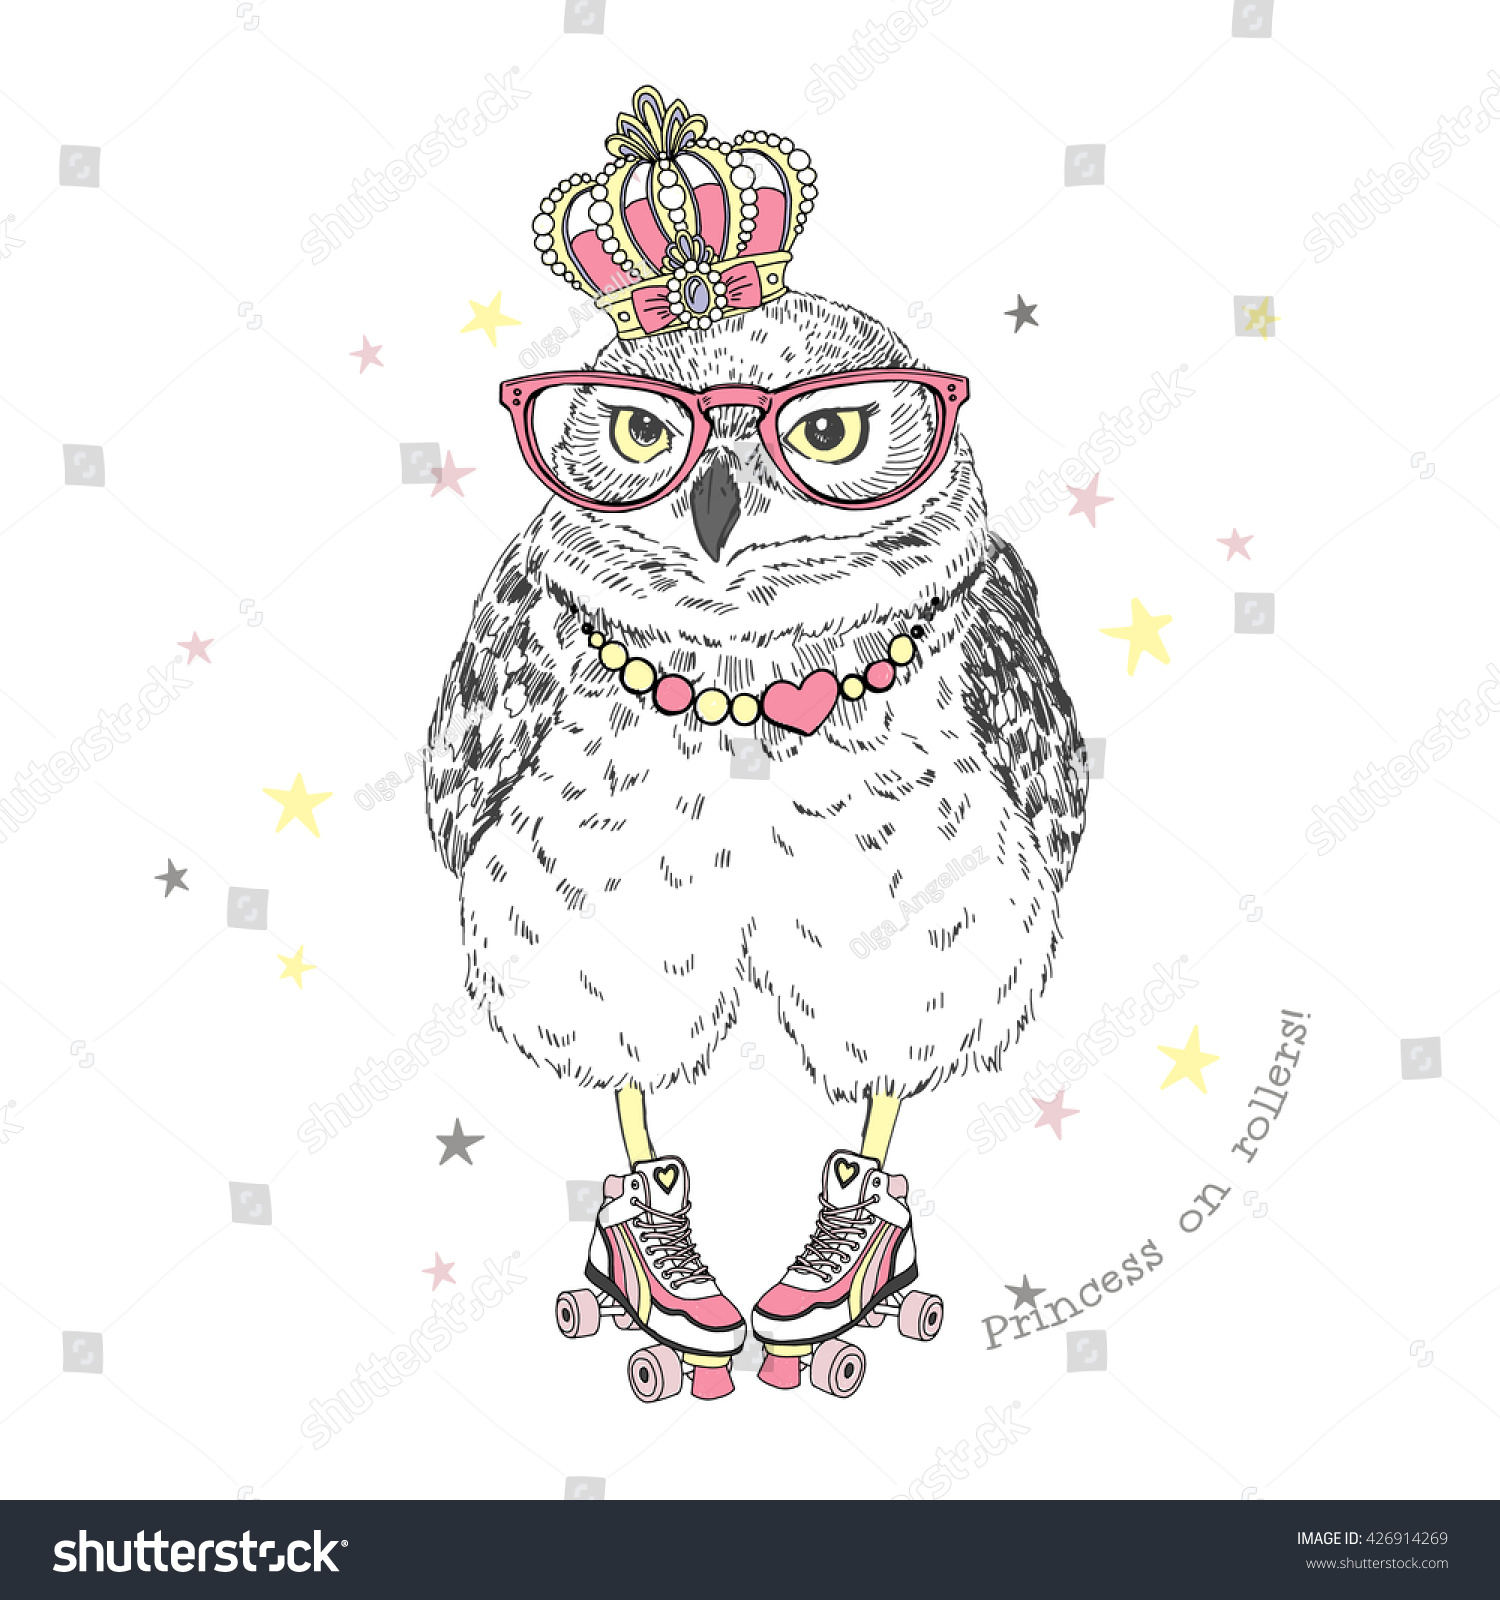 Roller skates book - Cute Owl Princess On Roller Skates Hand Drawn Graphic Animal Illustration